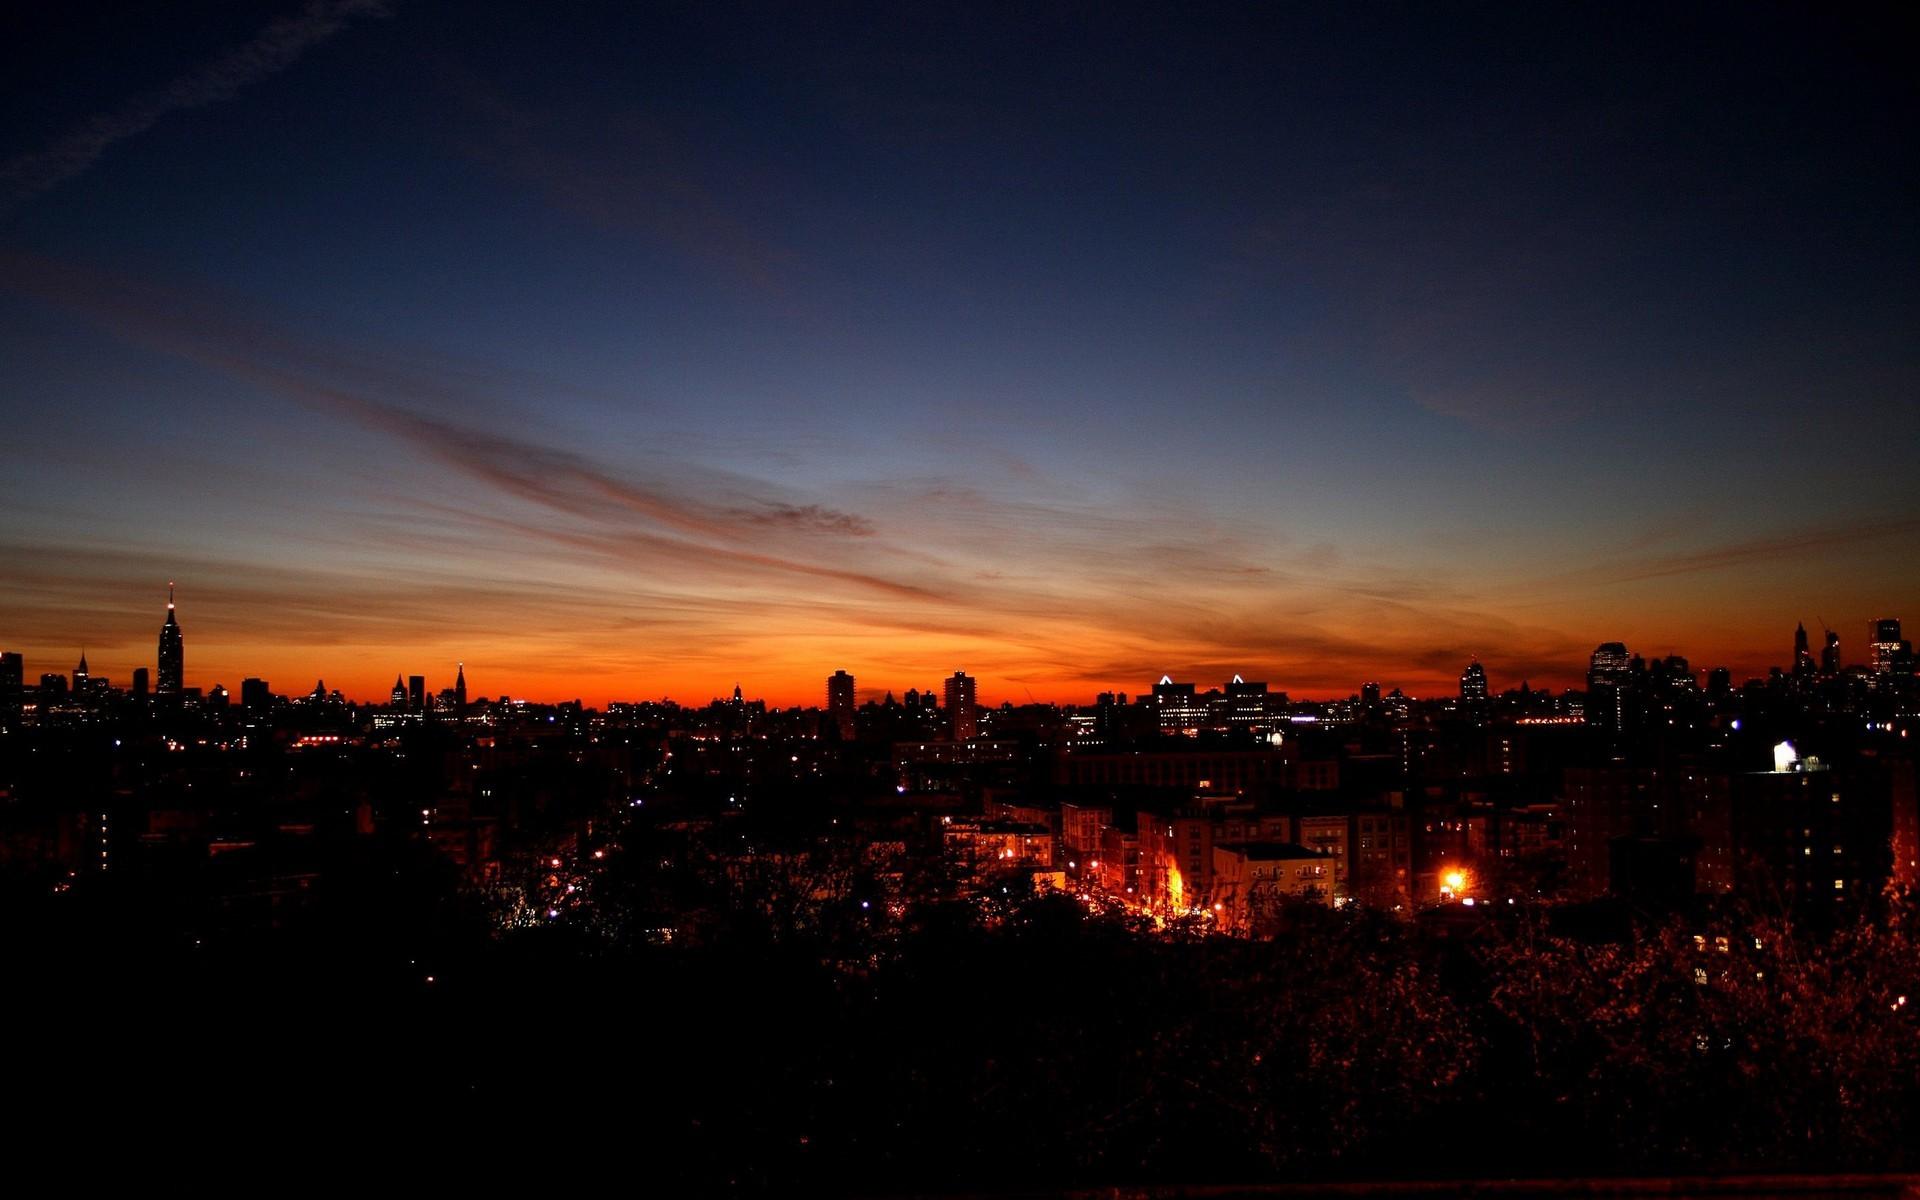 General 1920x1200 sunset cityscape city sky sunlight dark night